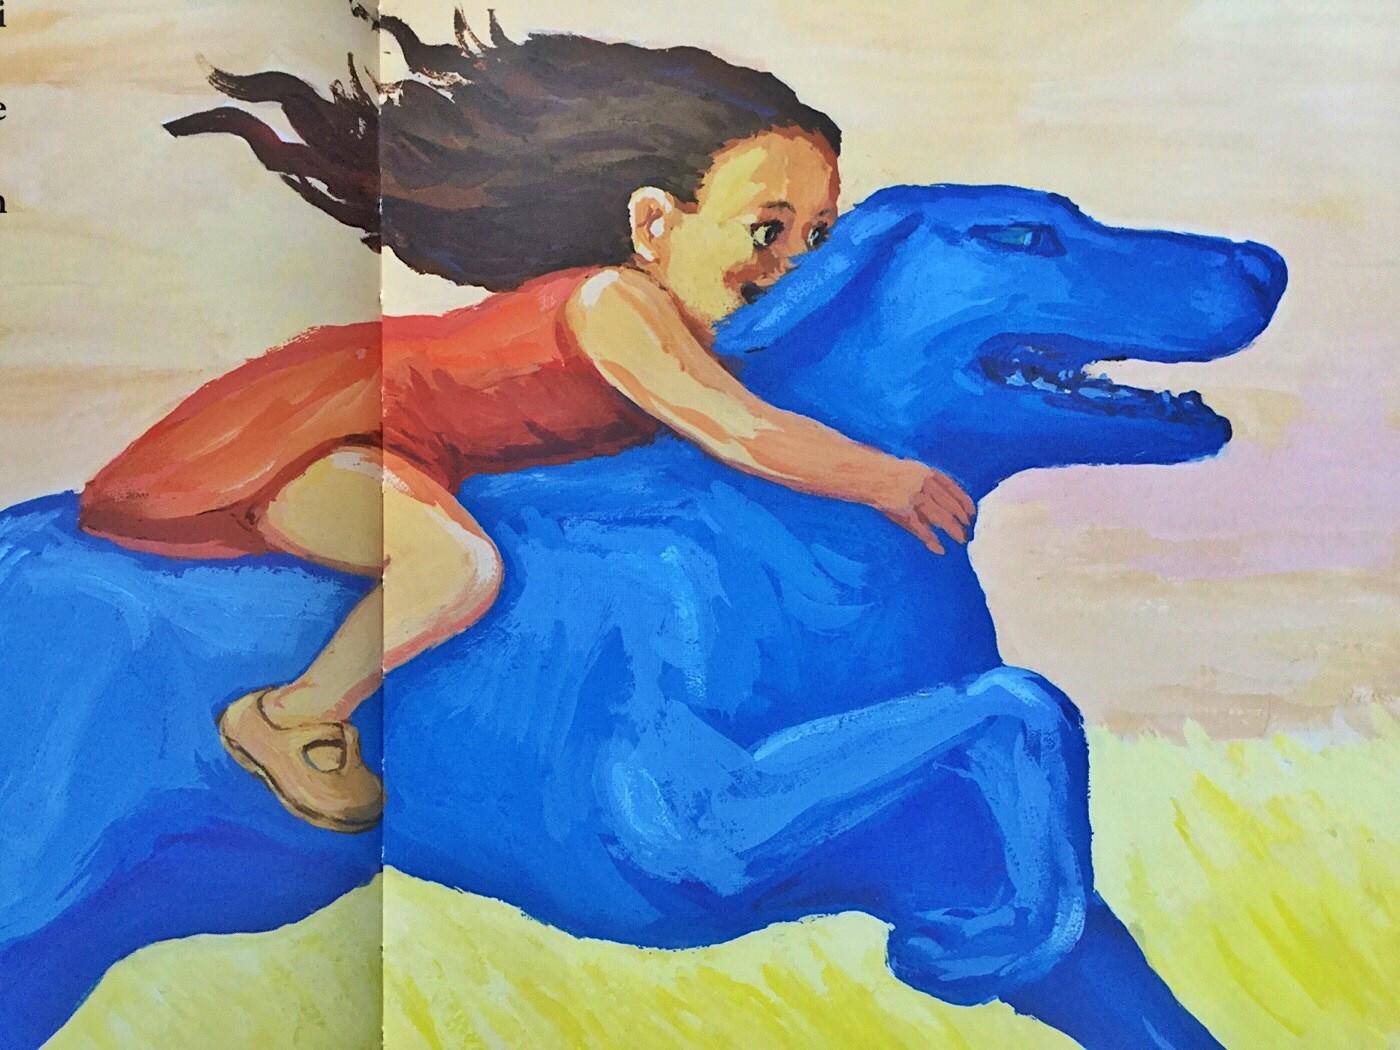 cane-blu-nadja-babalibri-galline-volanti